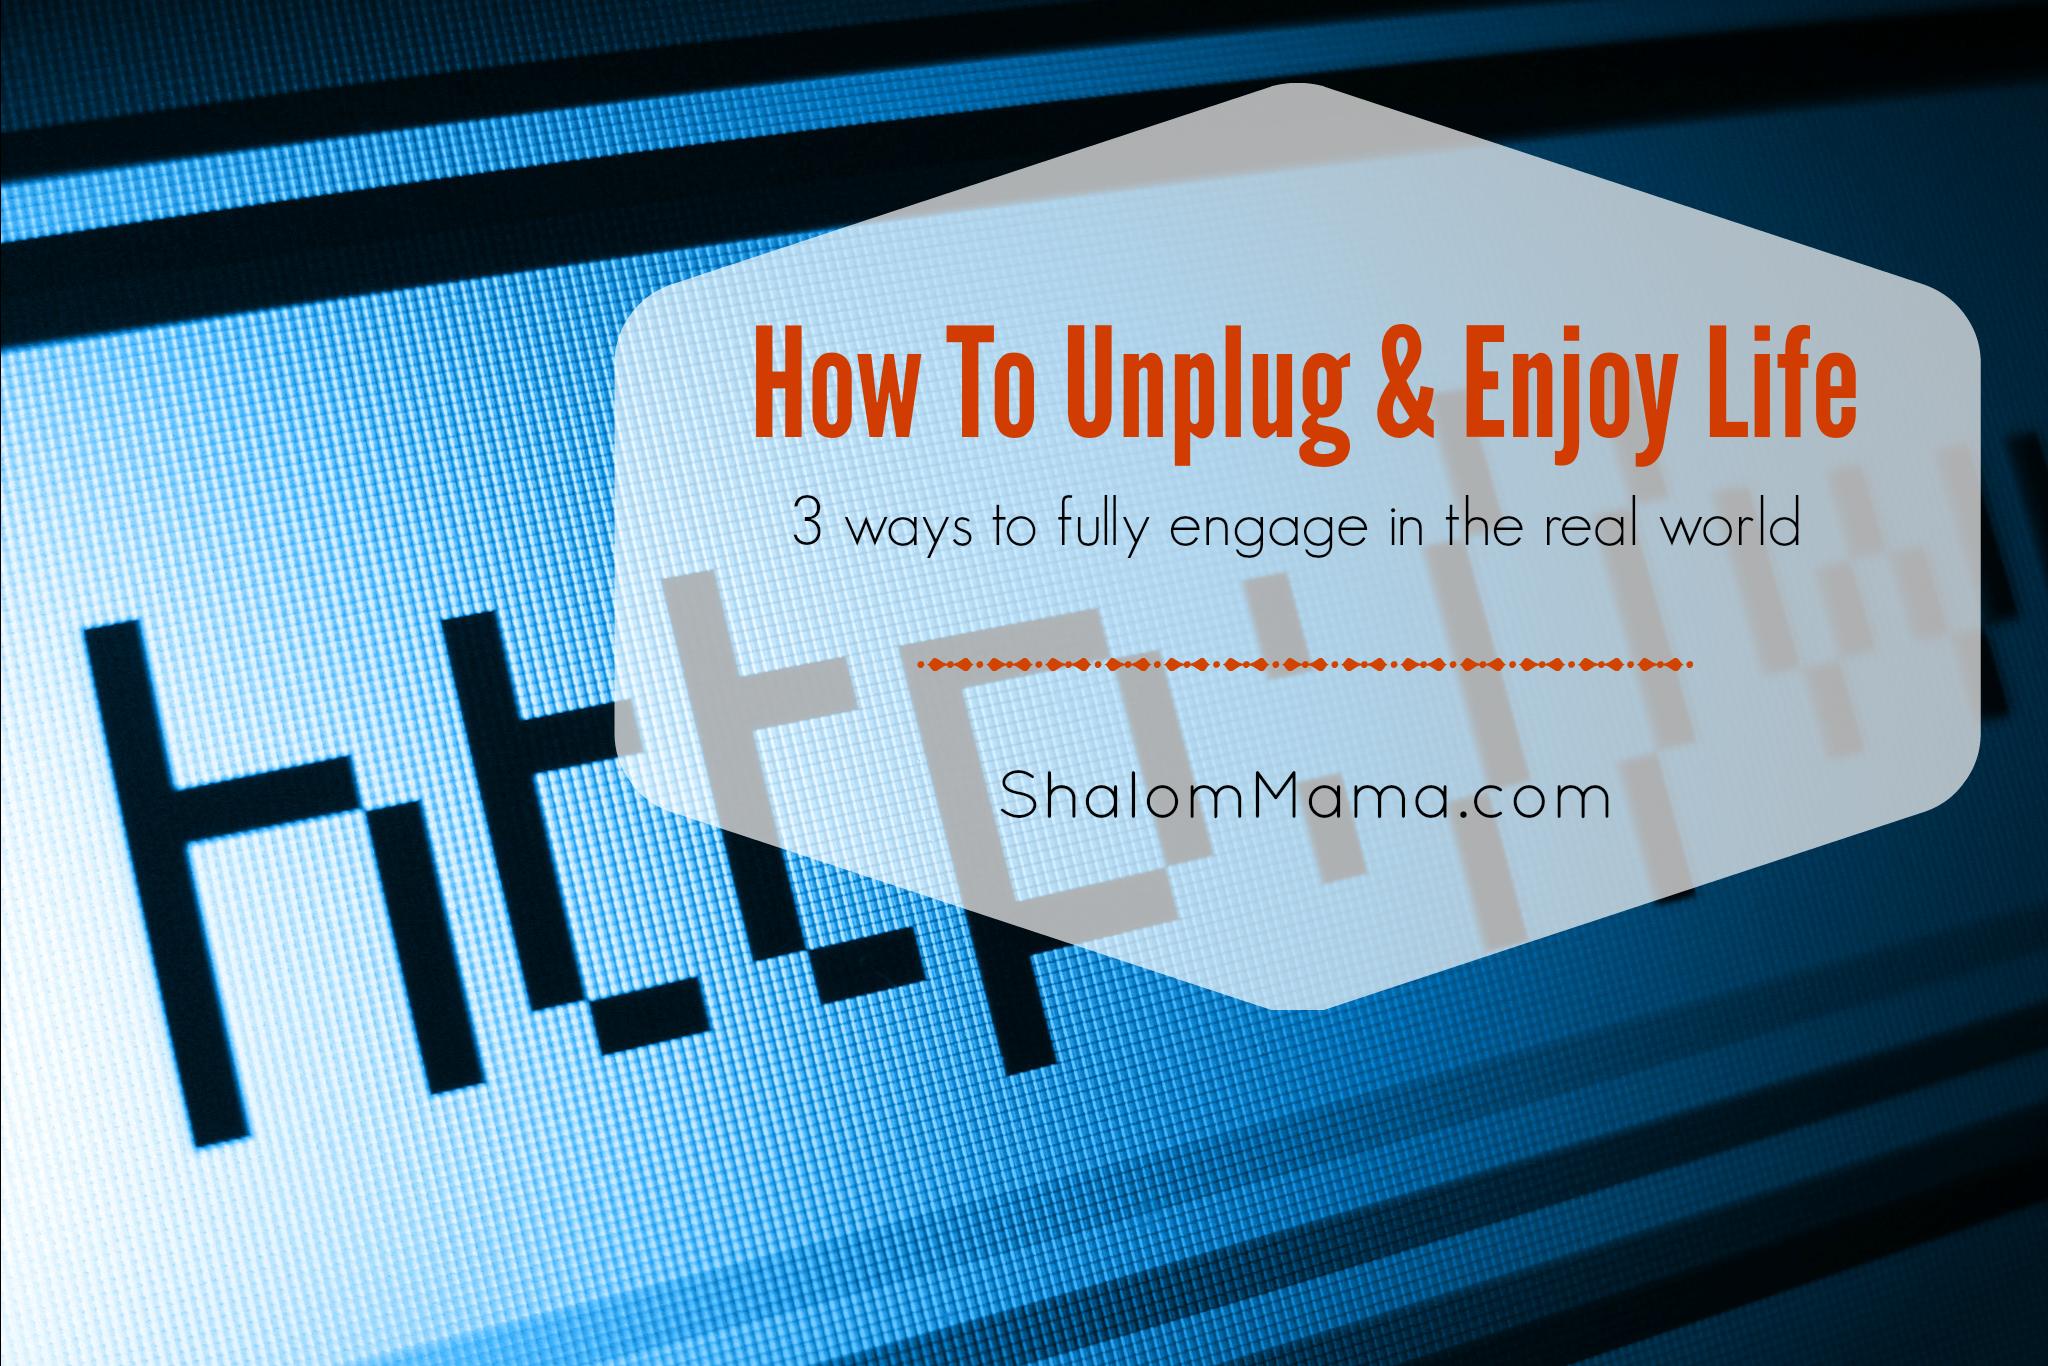 How To Unplug & Enjoy Life